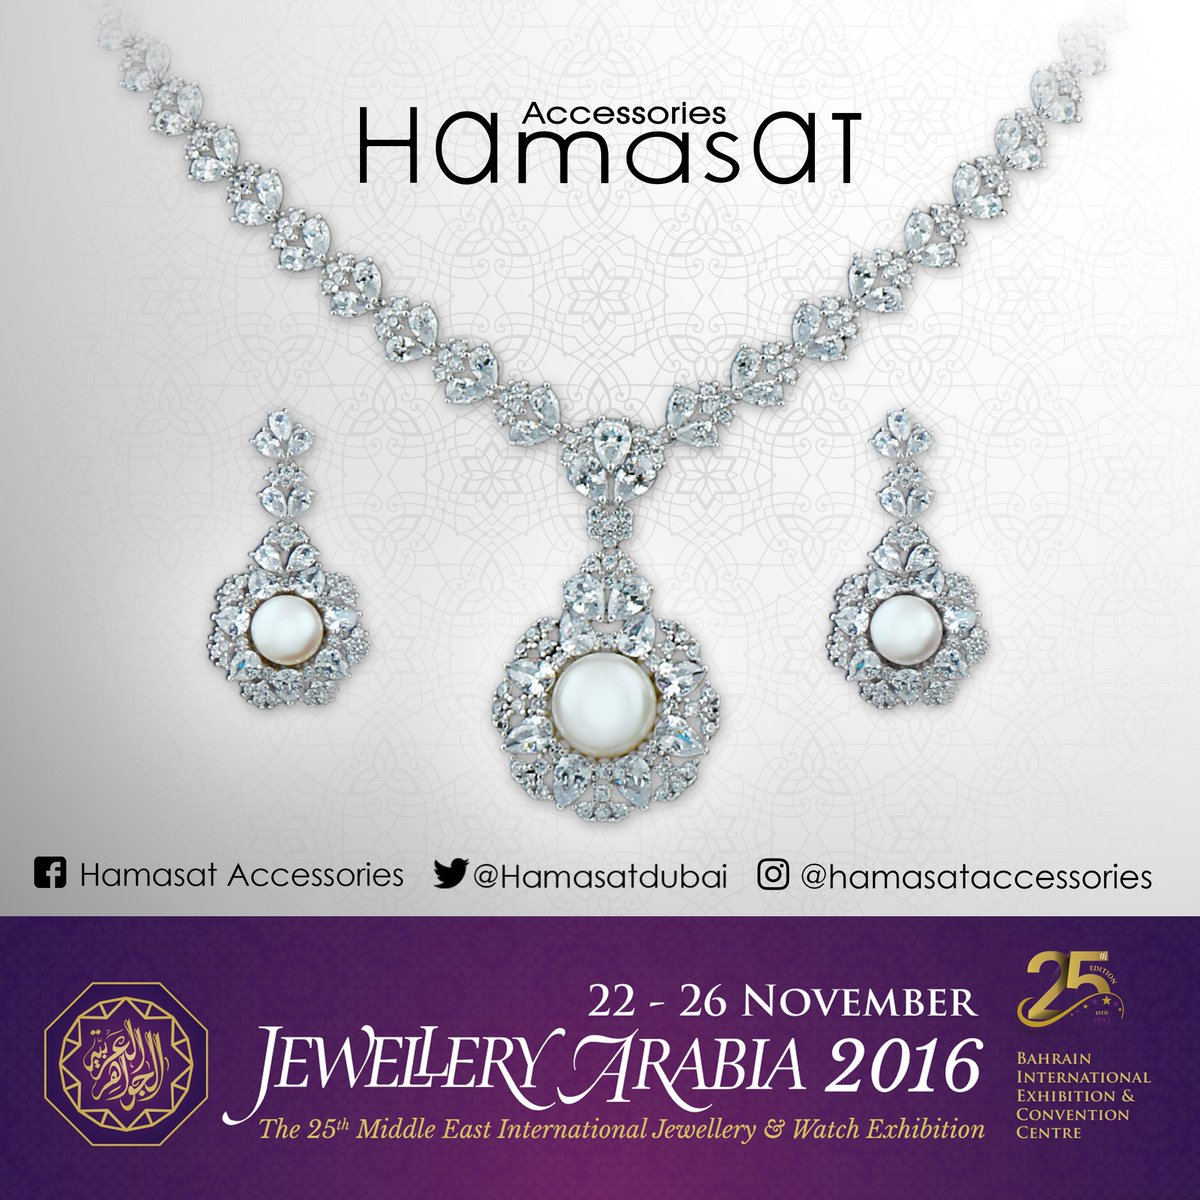 test Twitter Media - RT @Hamasatdubai: @jewelleryarabia See you at Jewellery Arabia Bahrain 22 - 26 Nov 2016 #jewelleryarabia https://t.co/OFXLgm6Dw3